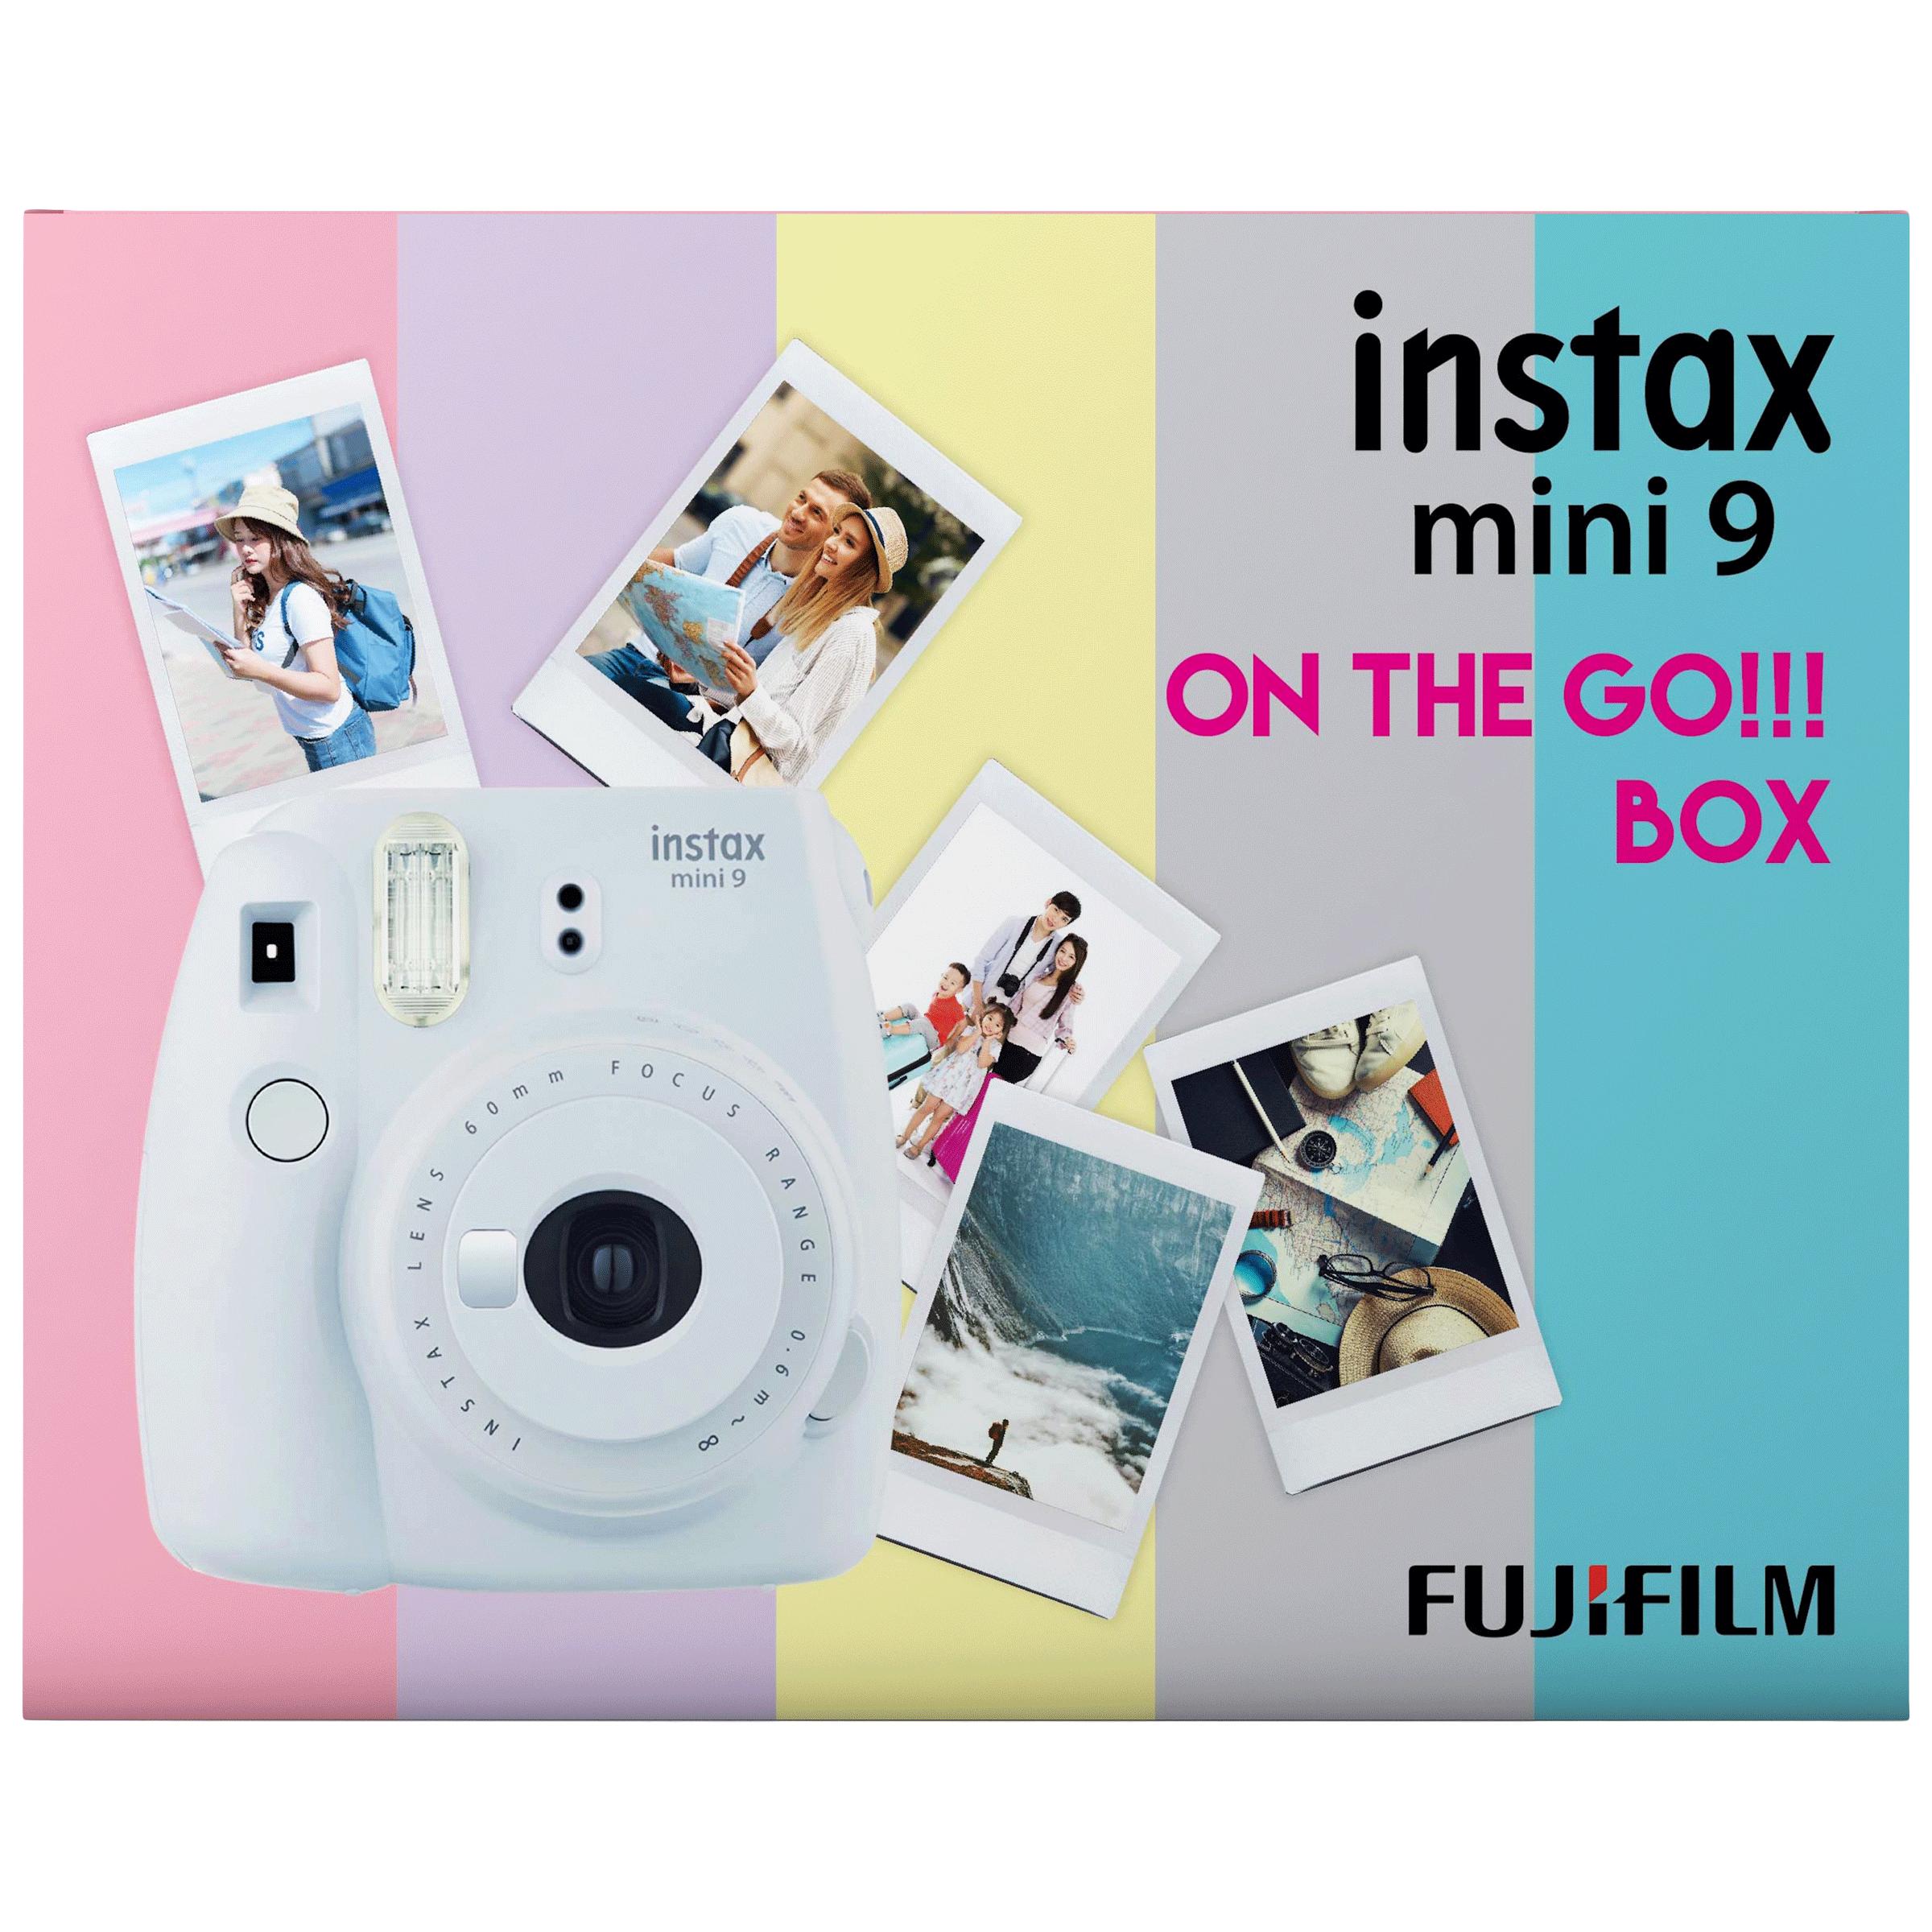 Fujifilm Instax Mini 9 On-The-Go Instant Camera Kit (Automatic Film Feeding Out, Smoky White)